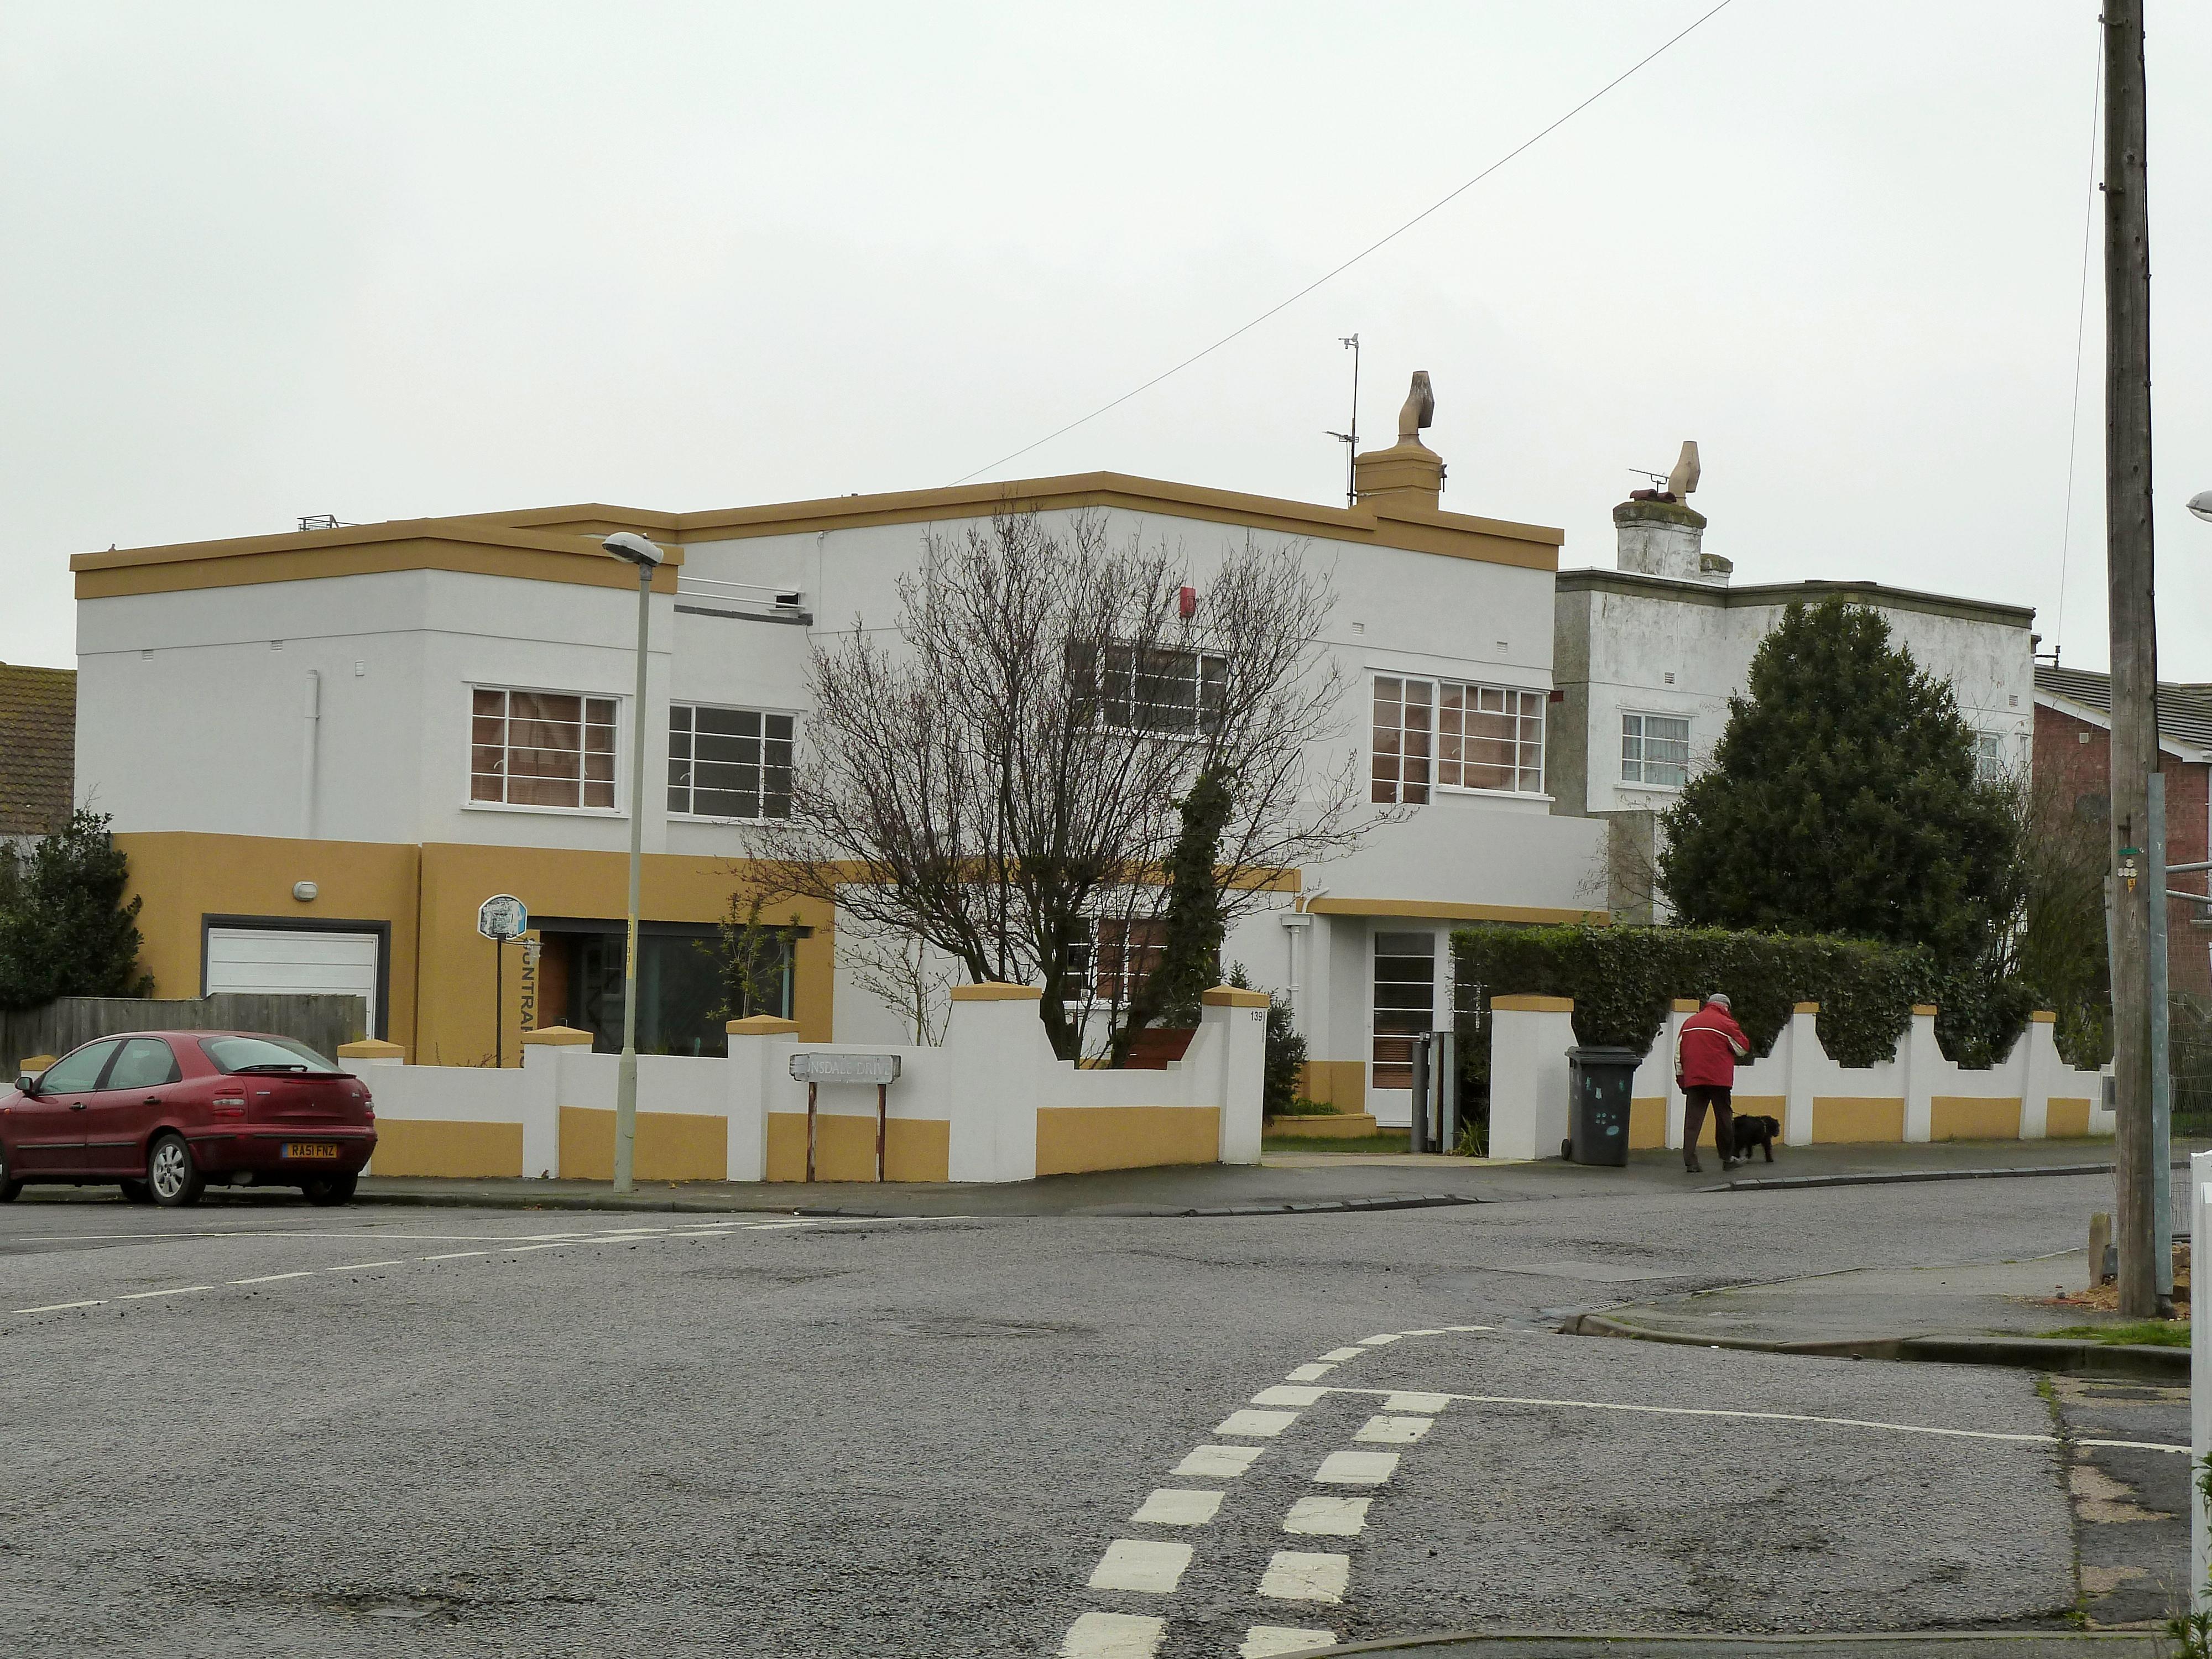 File:Art Deco houses in Grand Drive Herne Bay Kent.JPG